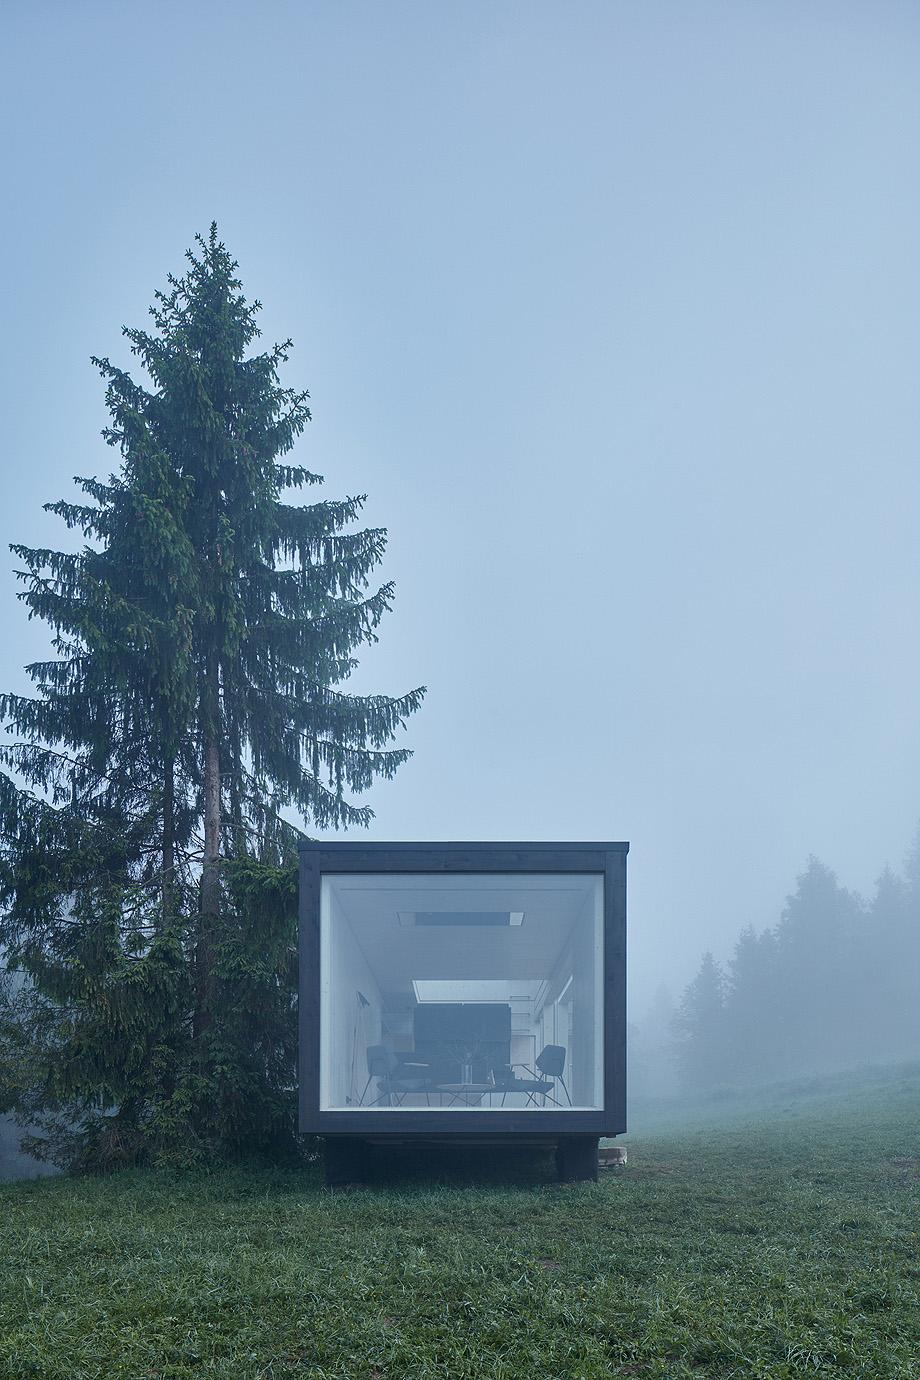 cabaña en eslovaquia de ark shelter - foto boysplaynice (2)